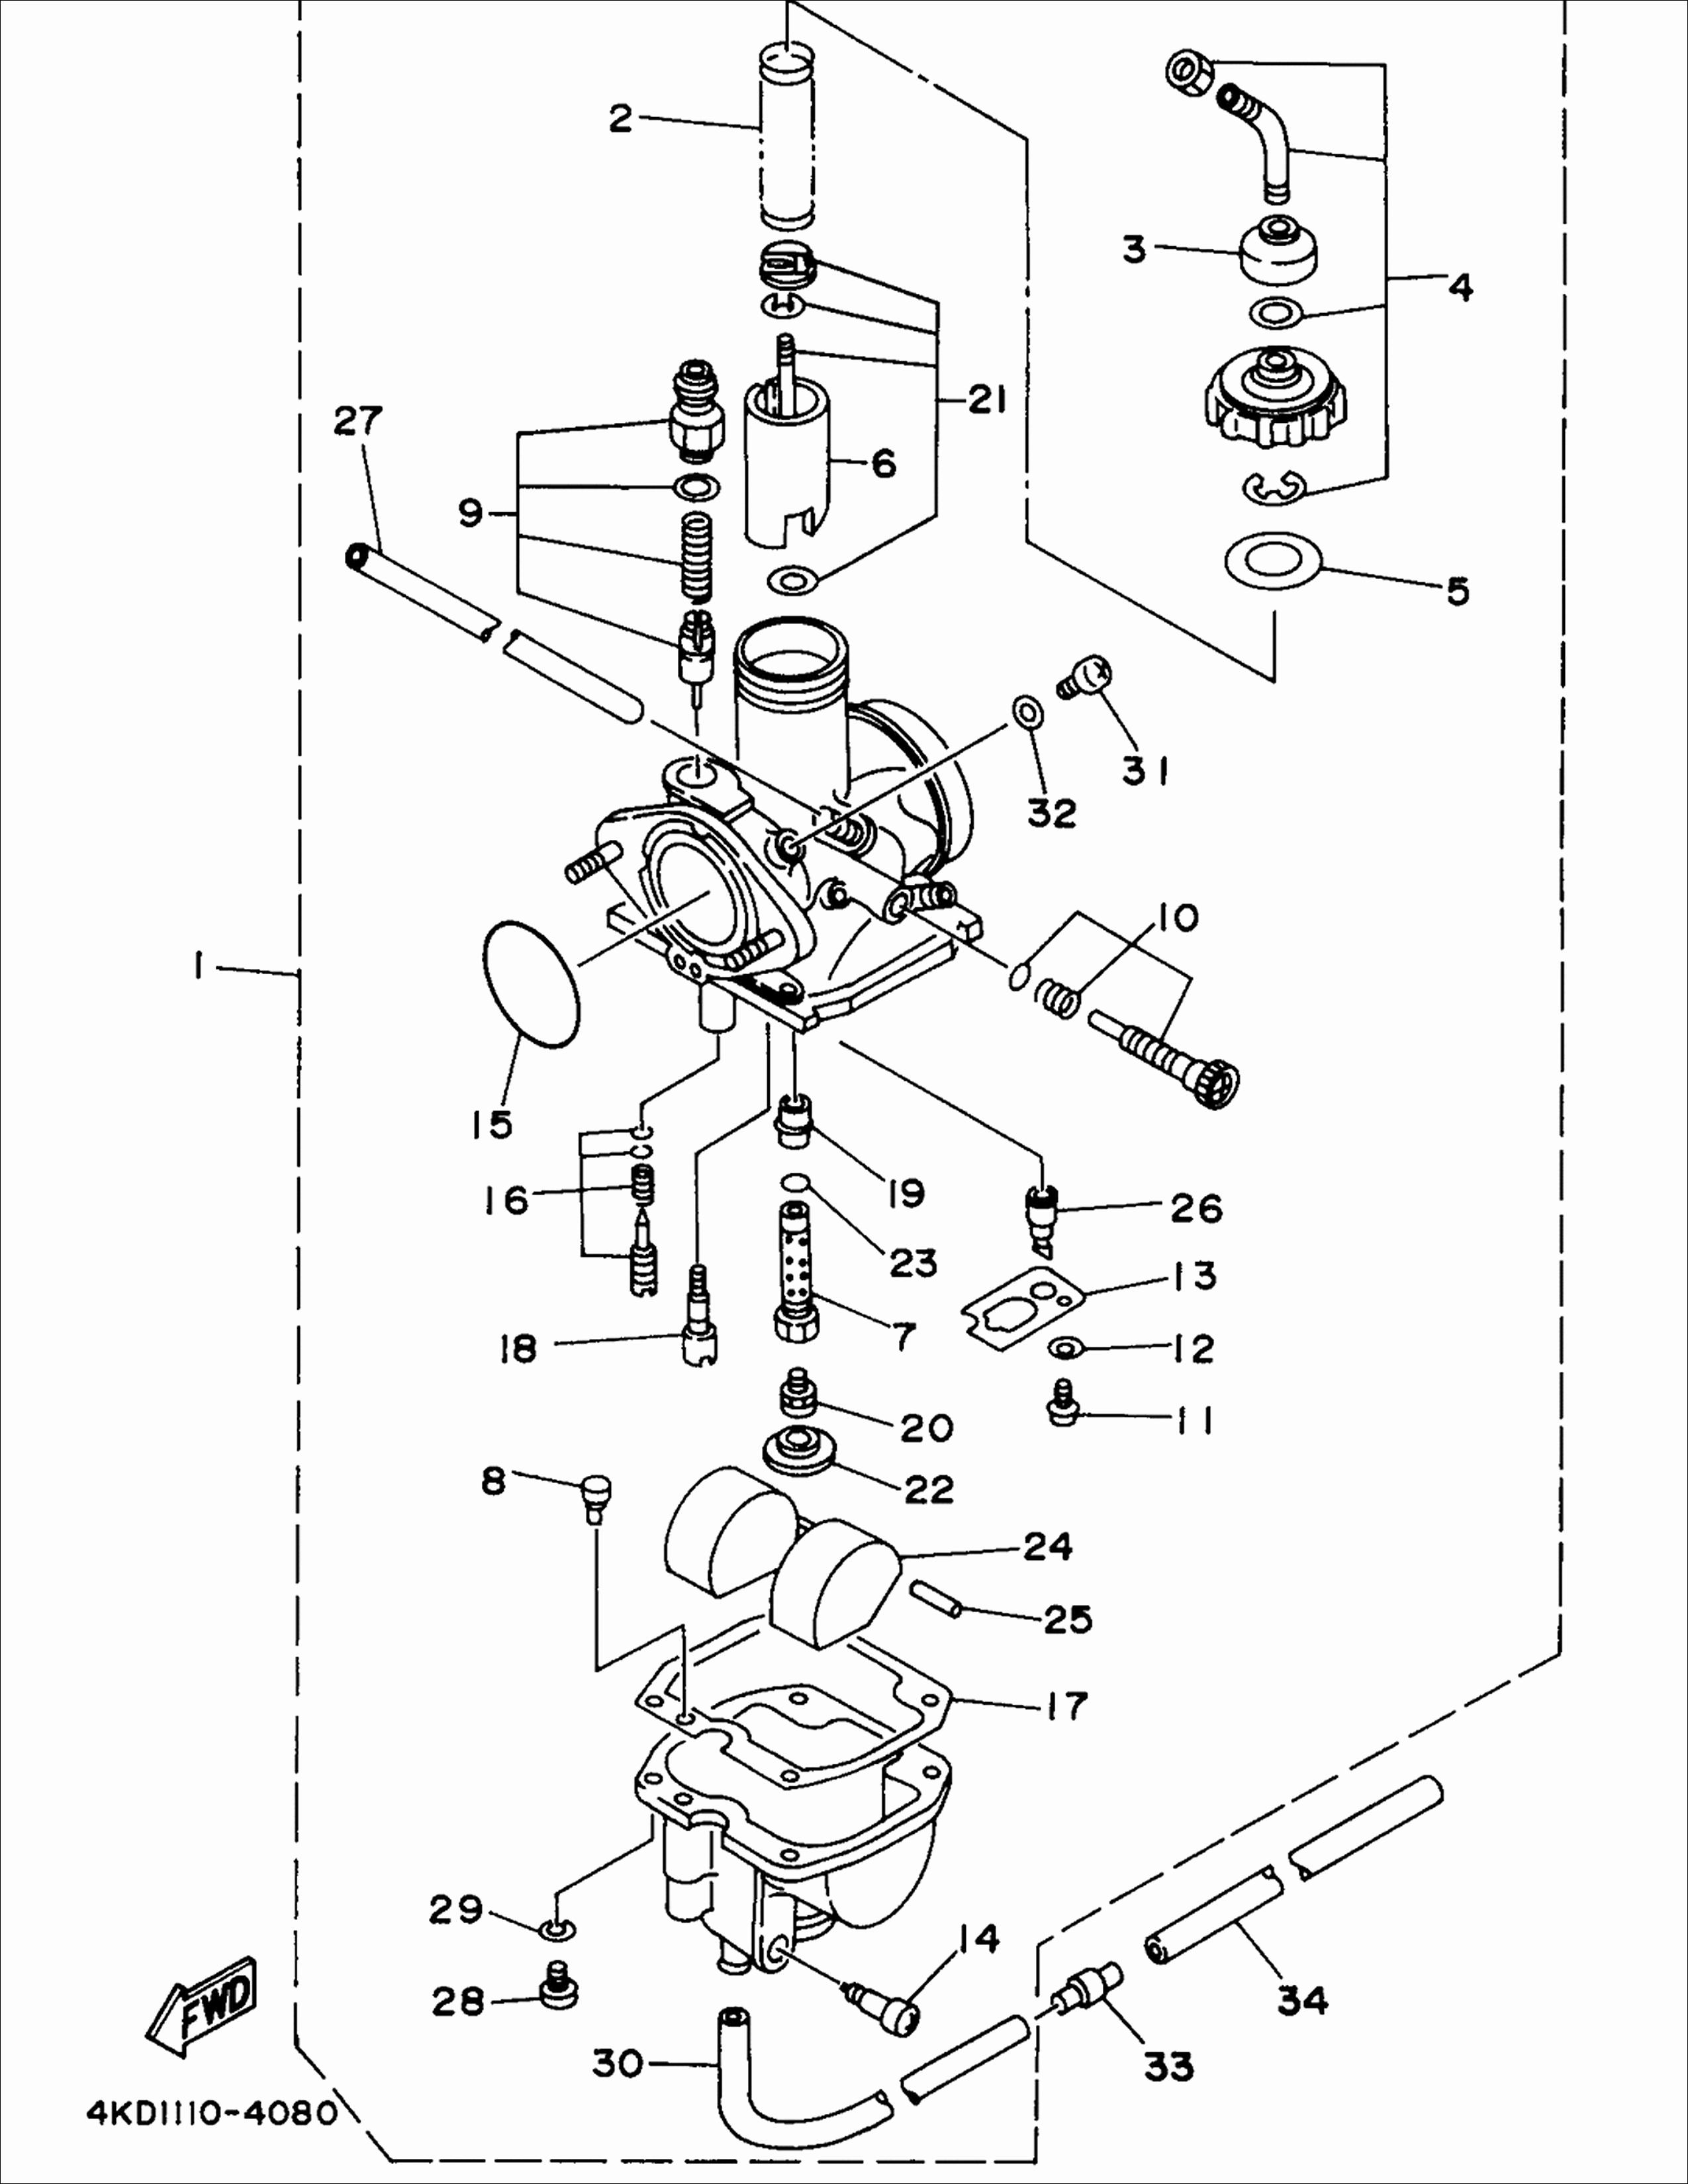 Schema Electrique Nissan 350z